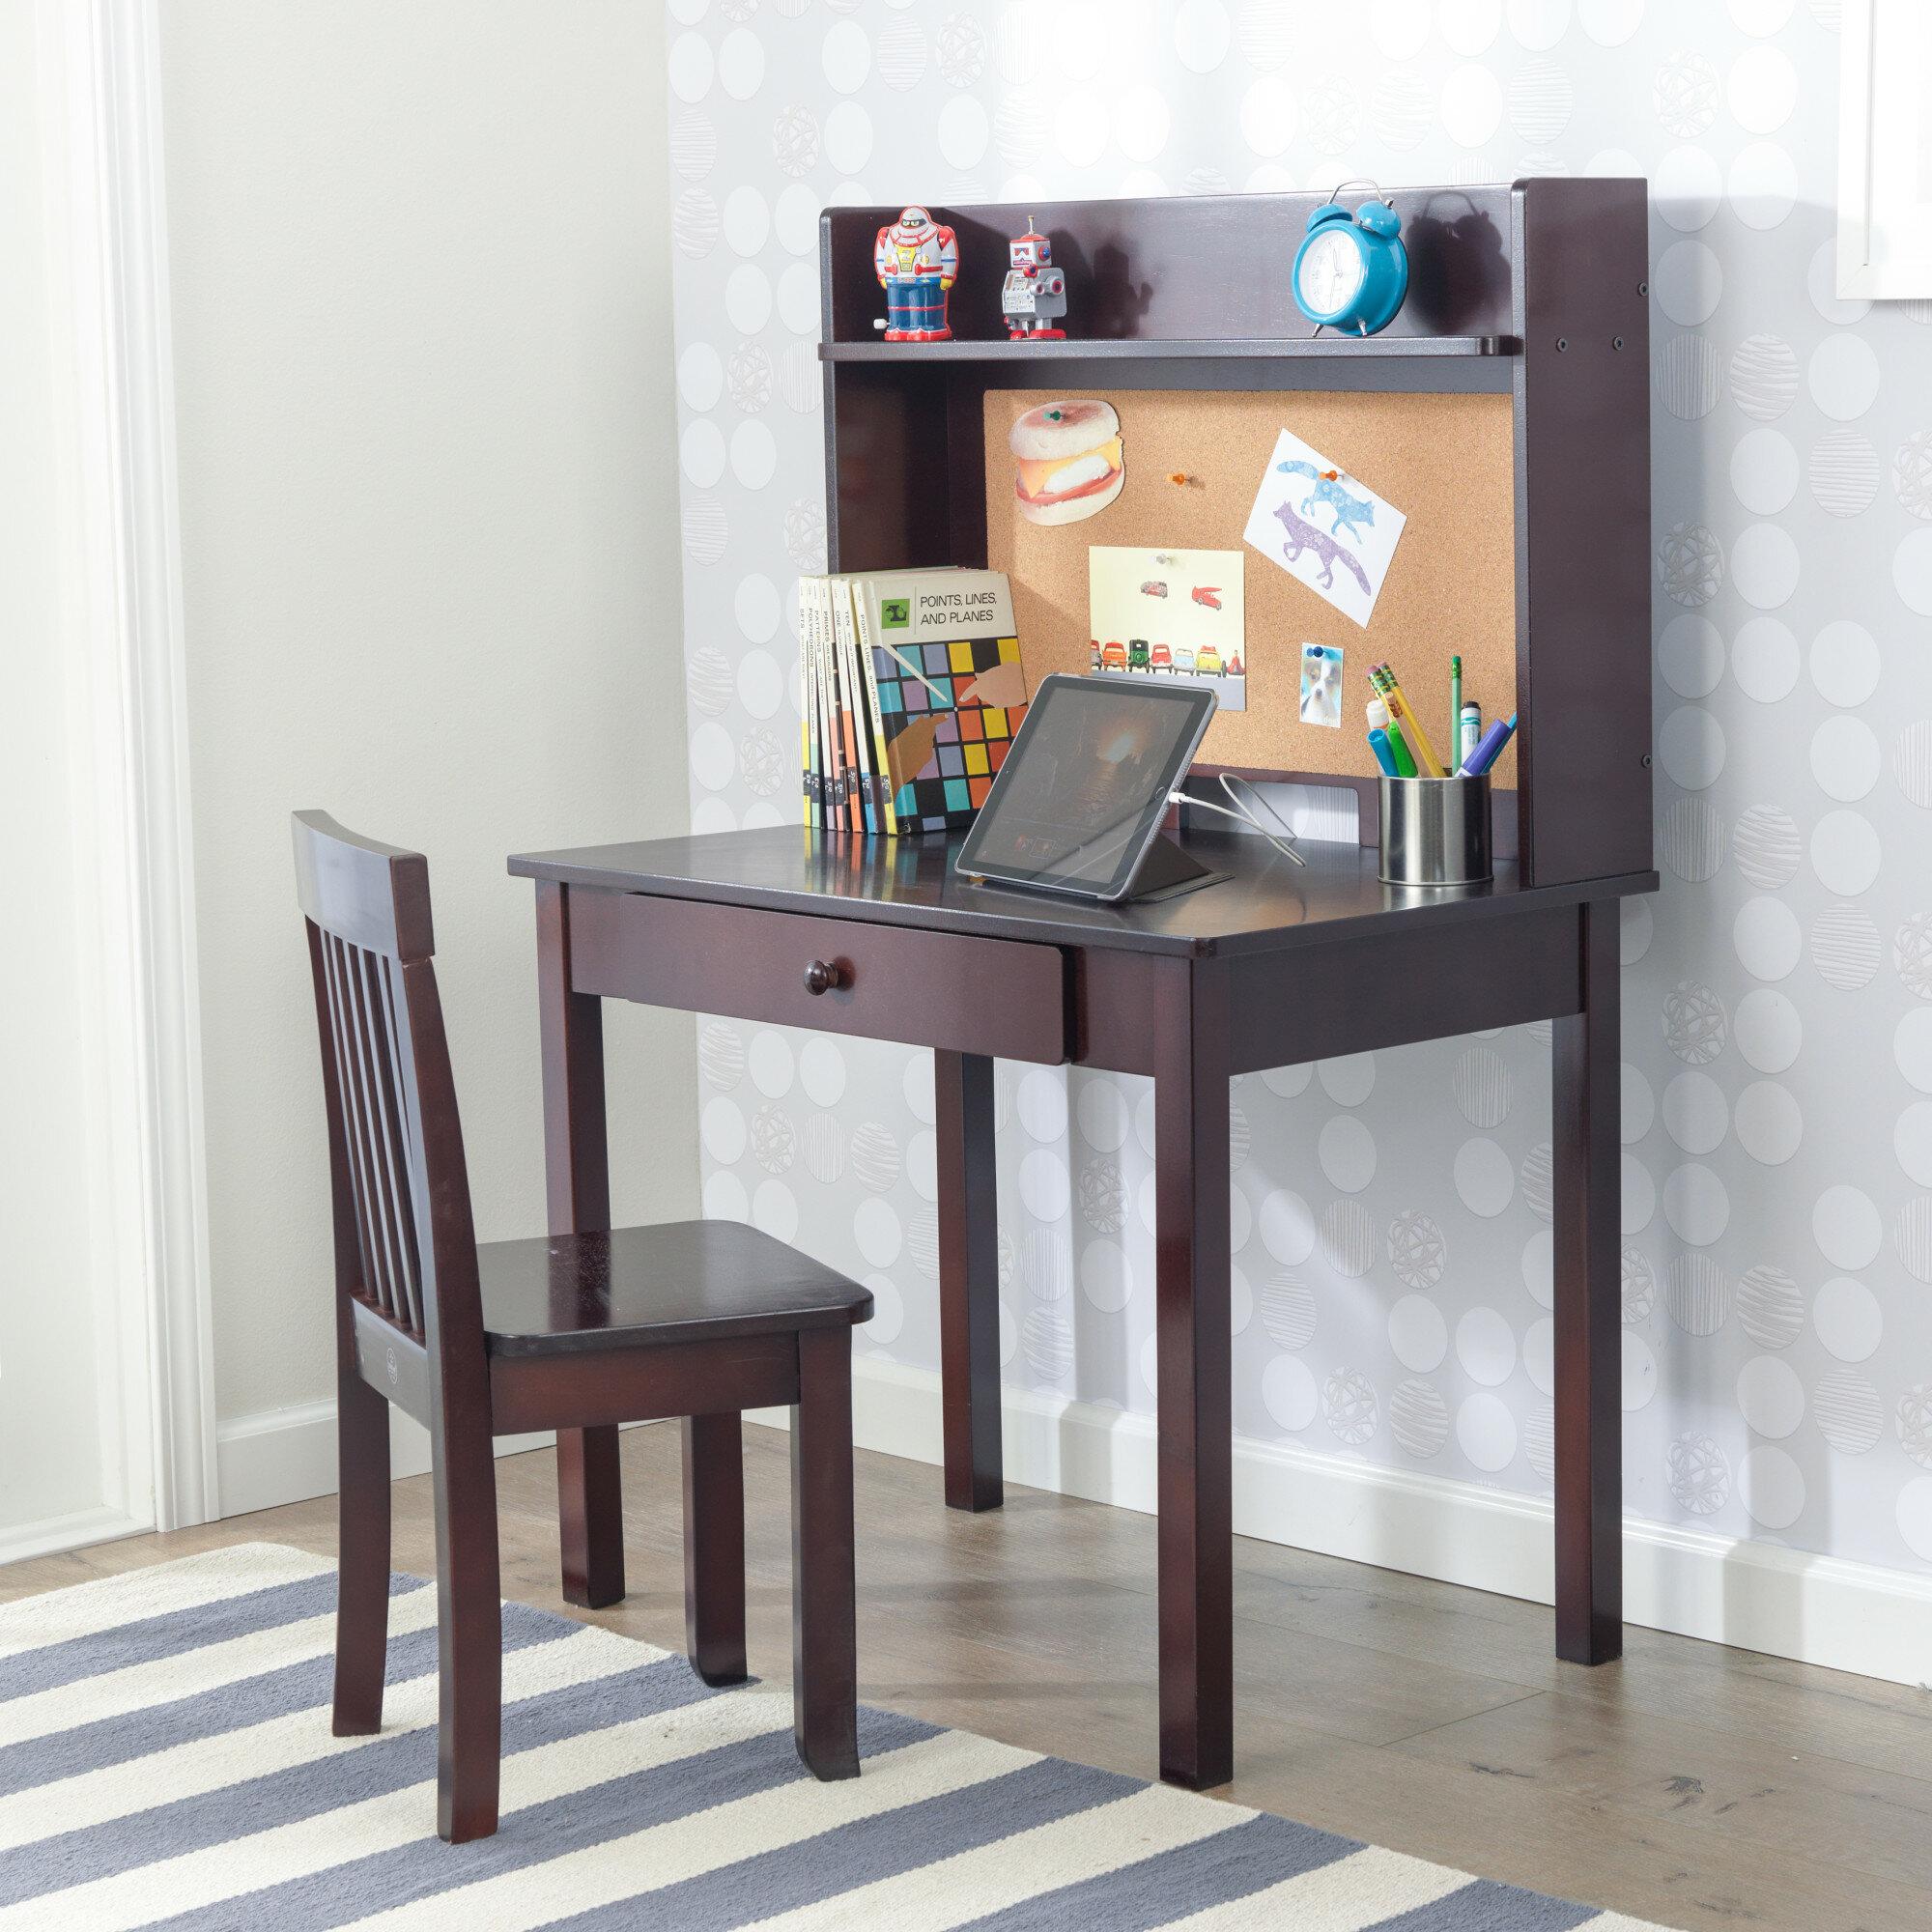 Surprising Kidkraft Pinboard Kids Study Desk And Chair Set With Kids Cjindustries Chair Design For Home Cjindustriesco